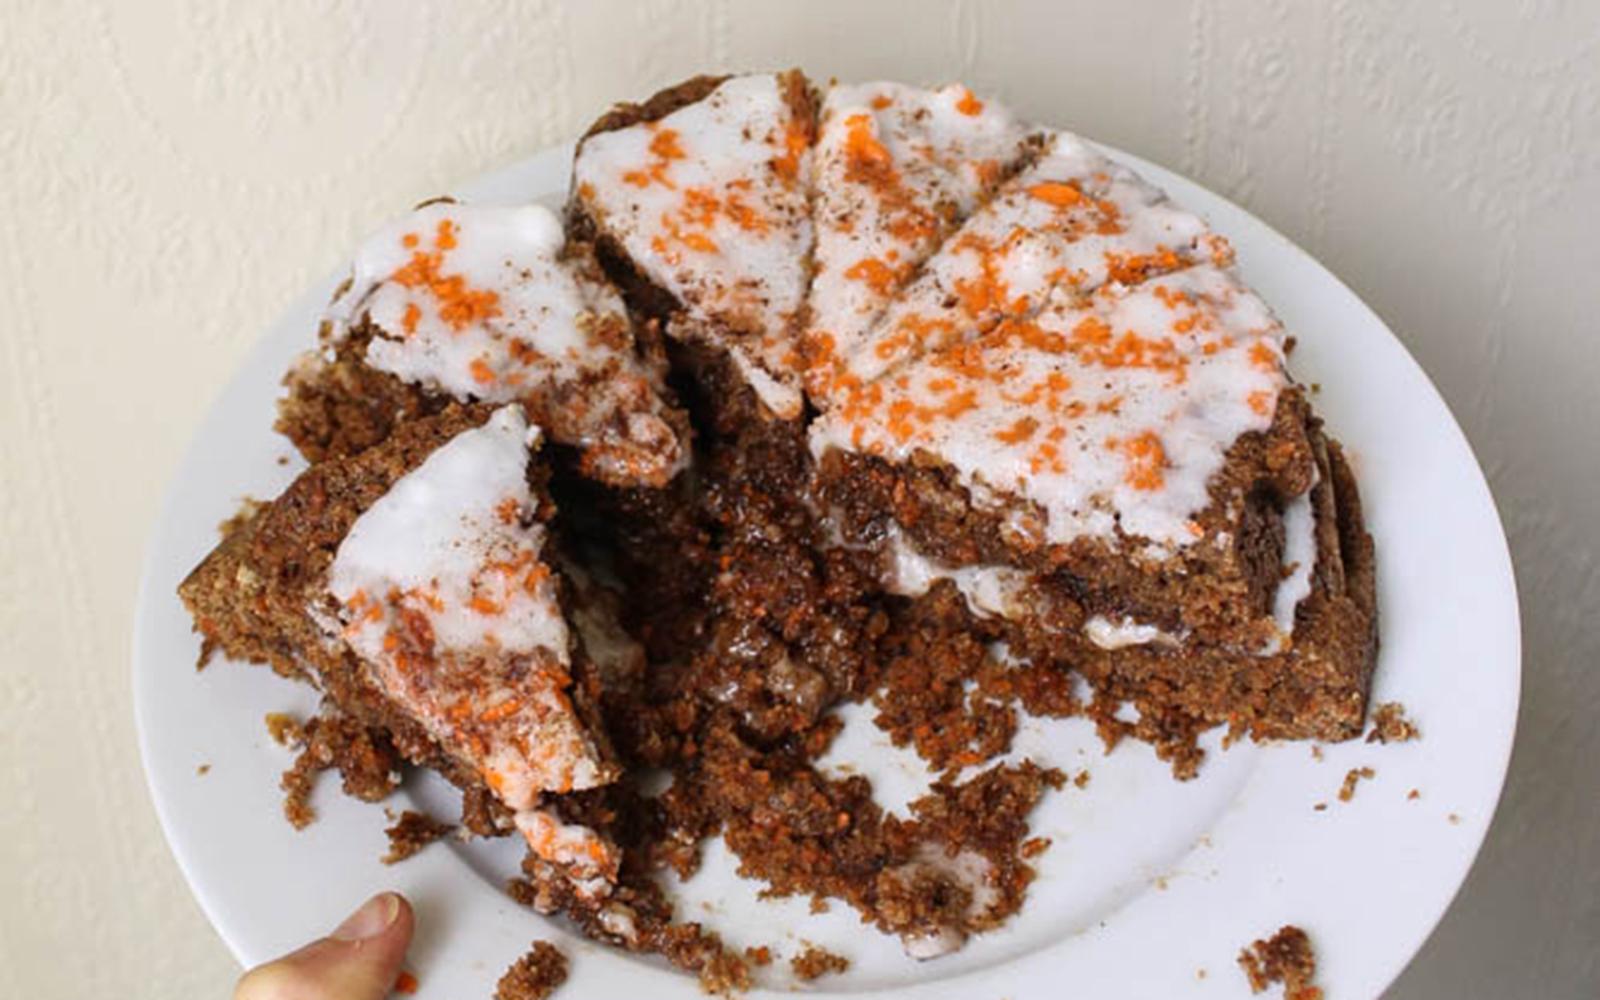 Iced Carrot Cake